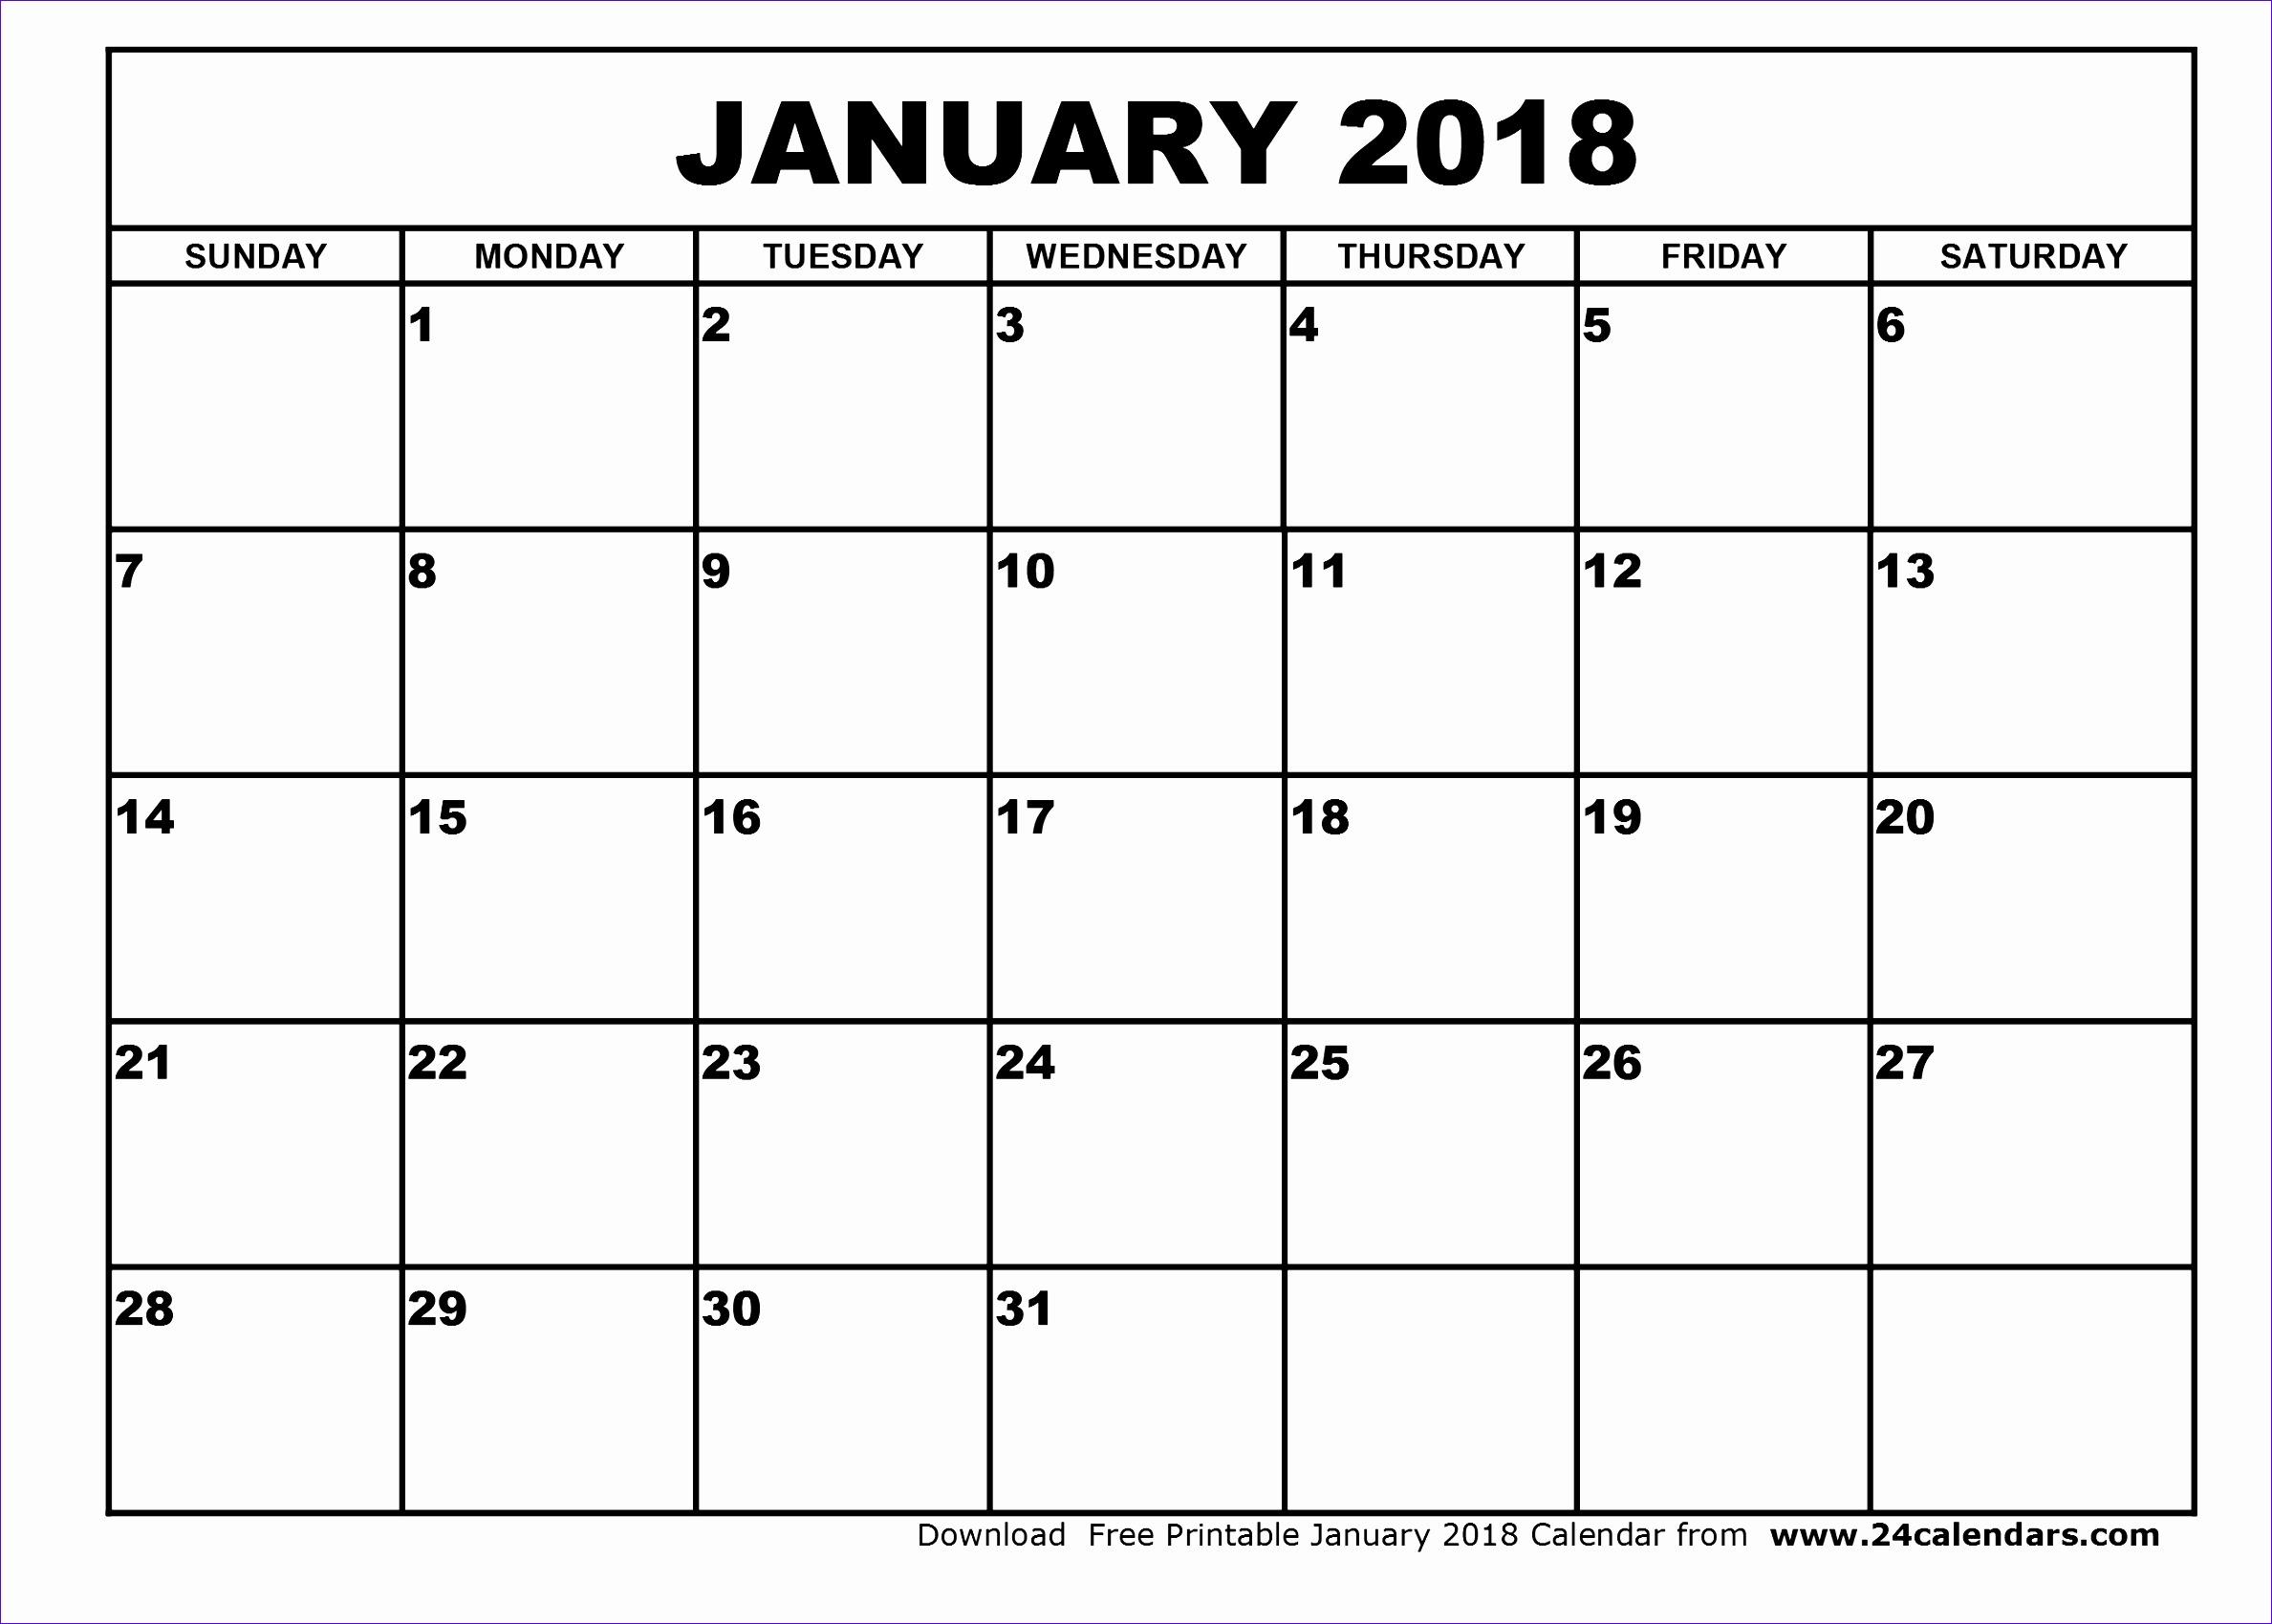 january 2018 calendar template 2275 23771699